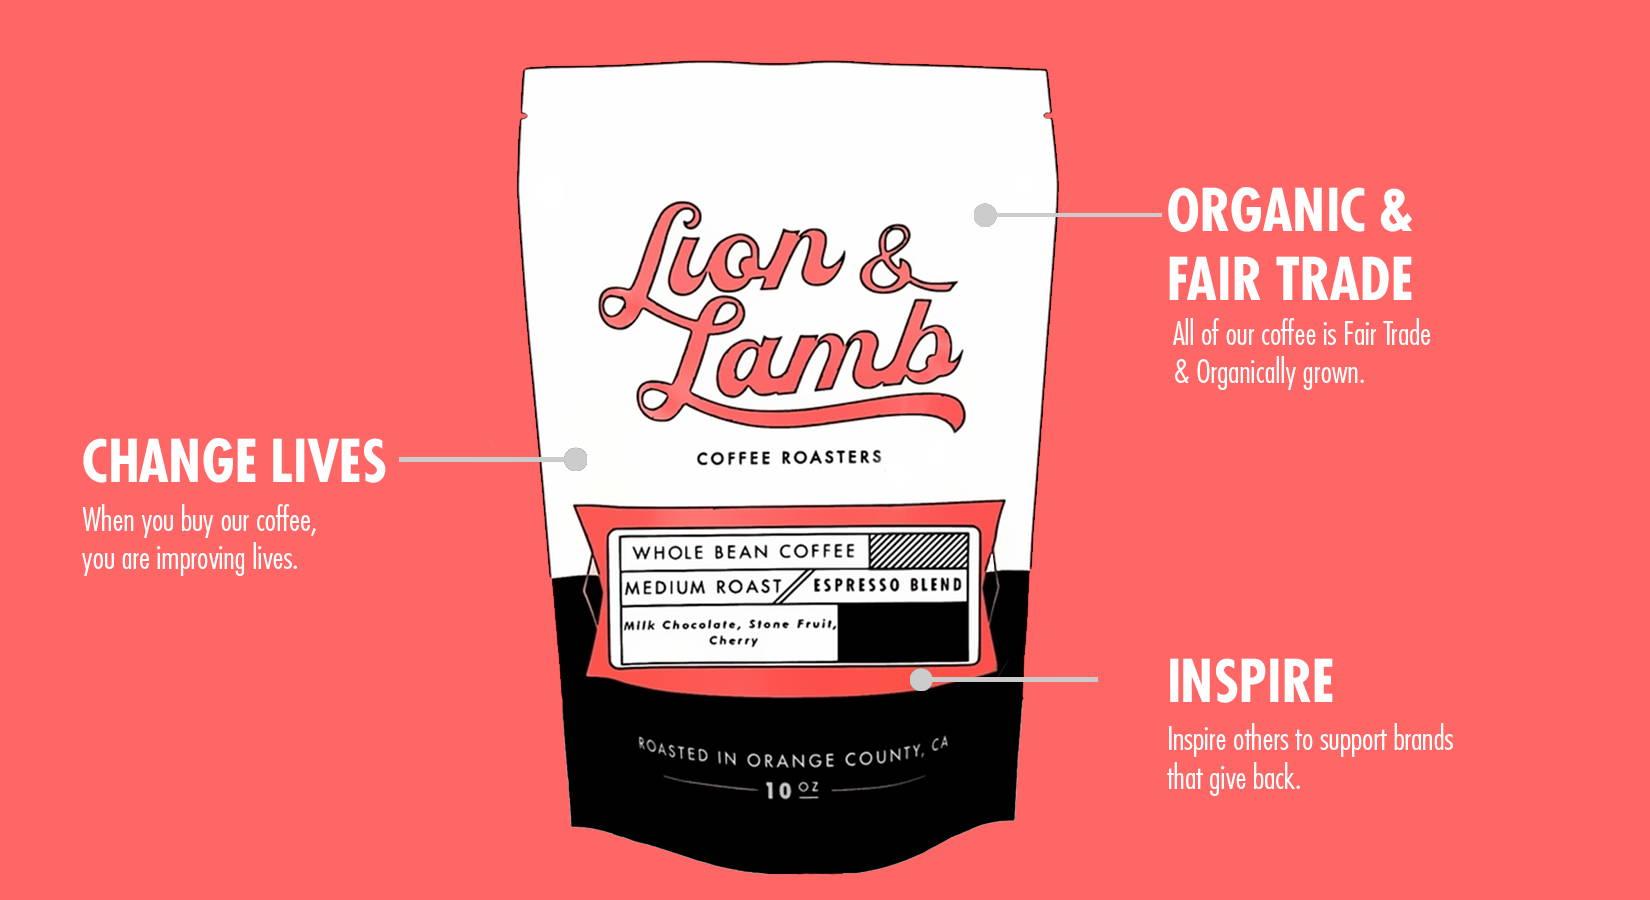 Cartoon artwork showing coffee bag that is fair trade and organic